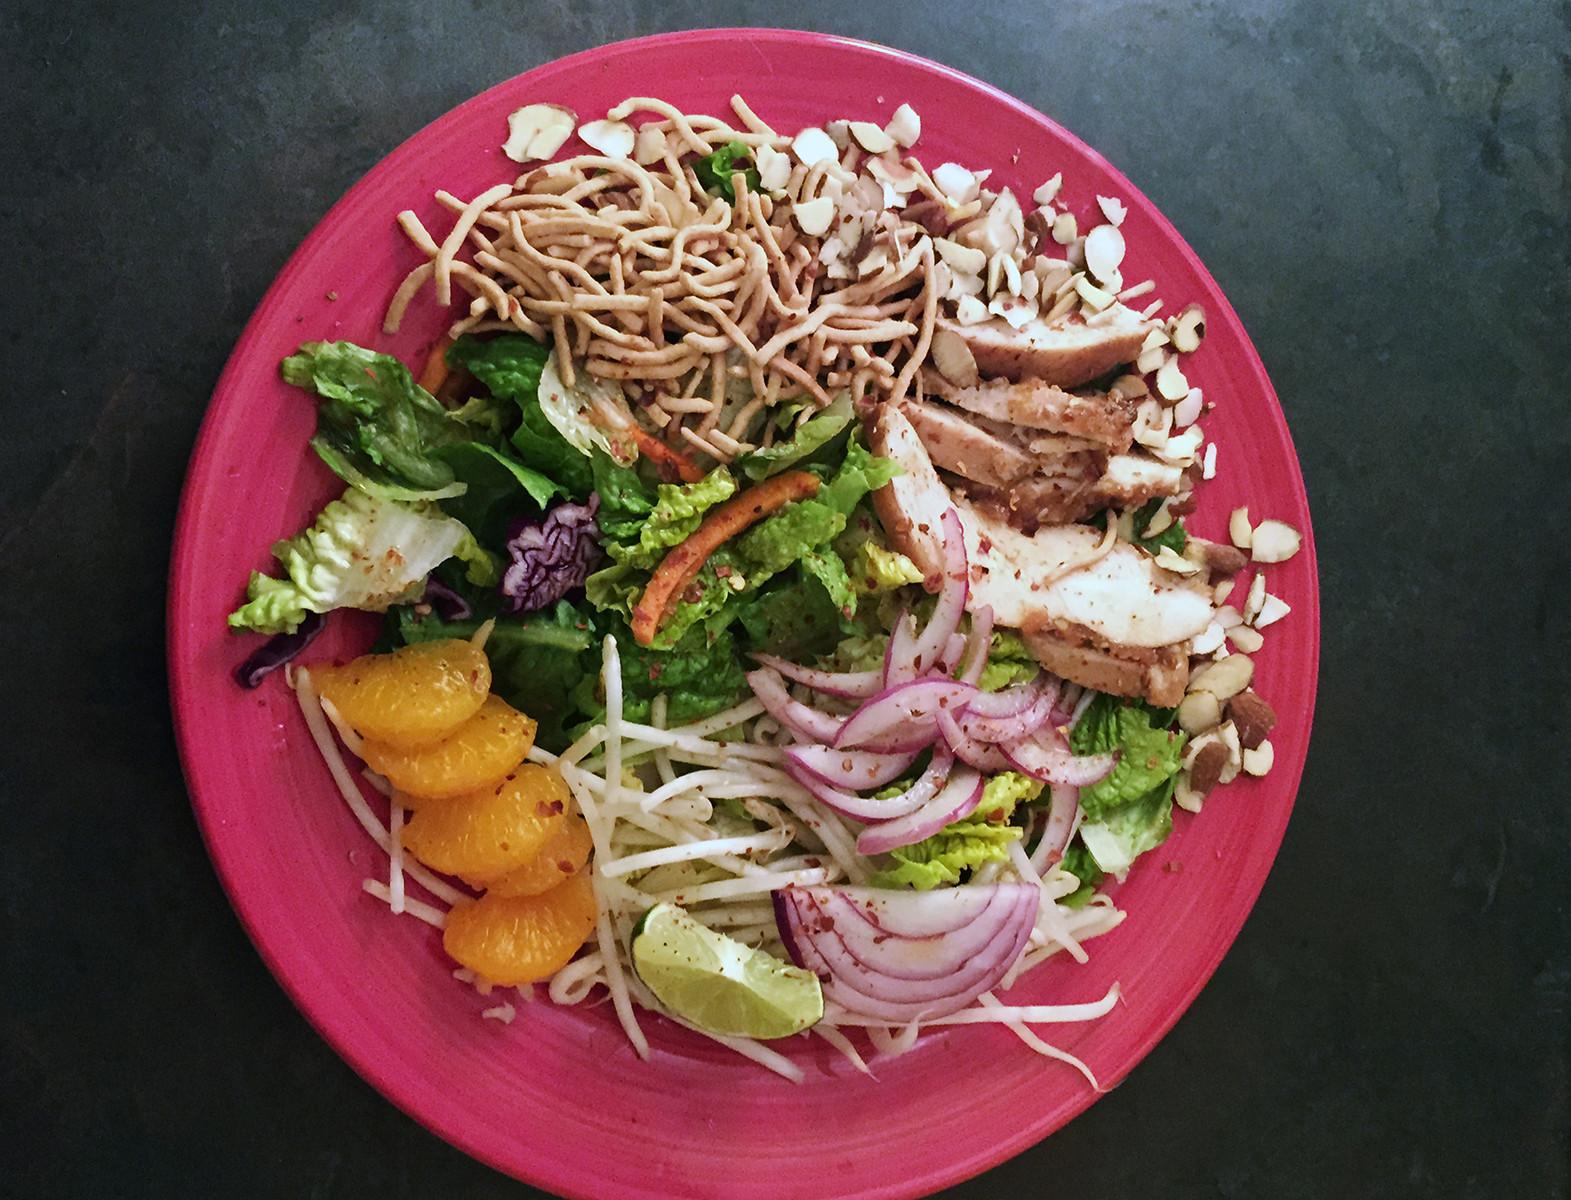 Infused Vinegars – rokz shakes up salads, too!